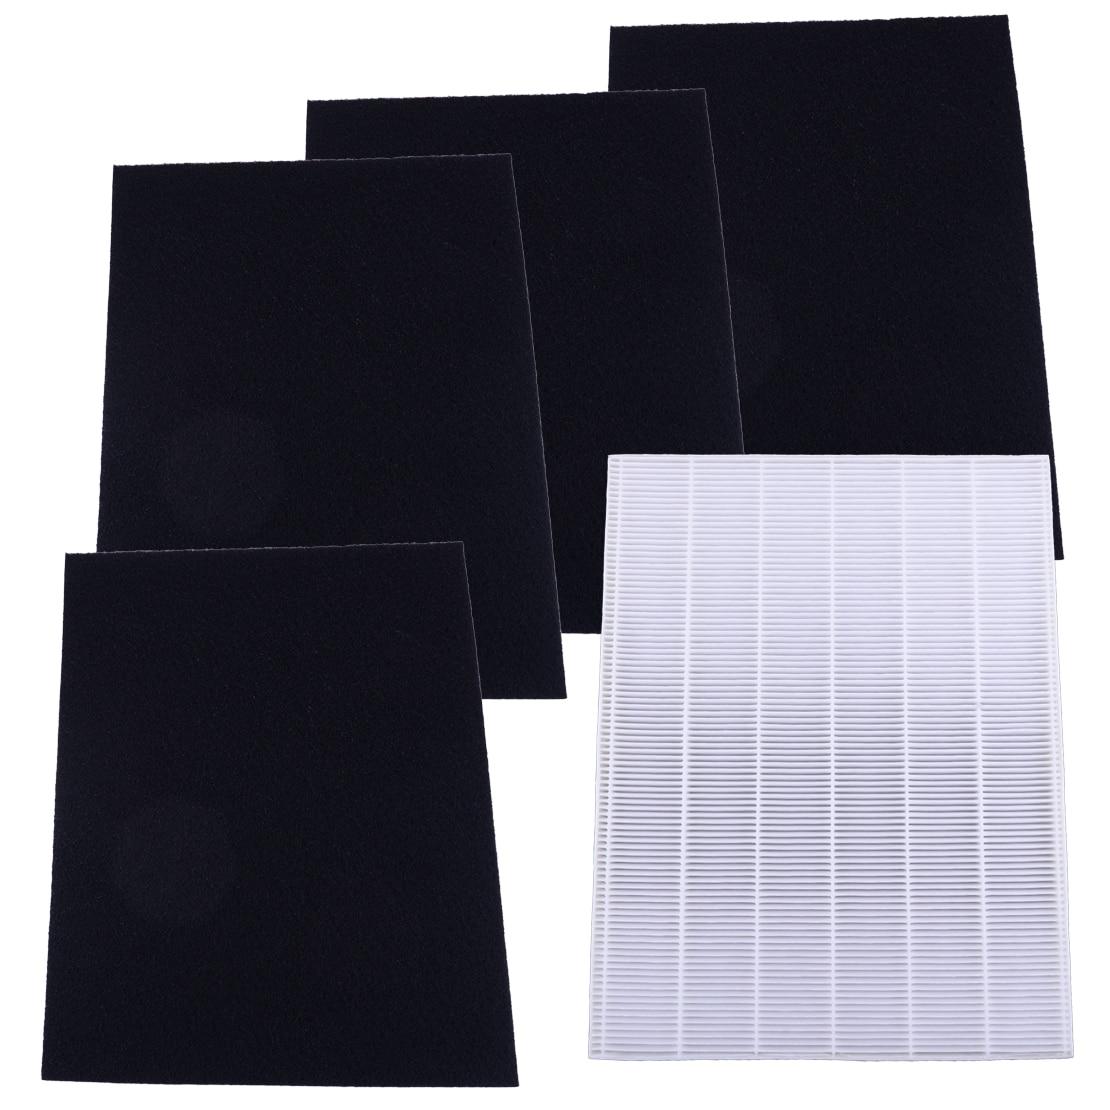 LETAOSK 5pcs HEPA & Carbon Pre Filters Set Fit For Winix 115115 WAC5300 WAC5500 WAC6300 Air Purifier P300 U300 9500 9000 WAC9500